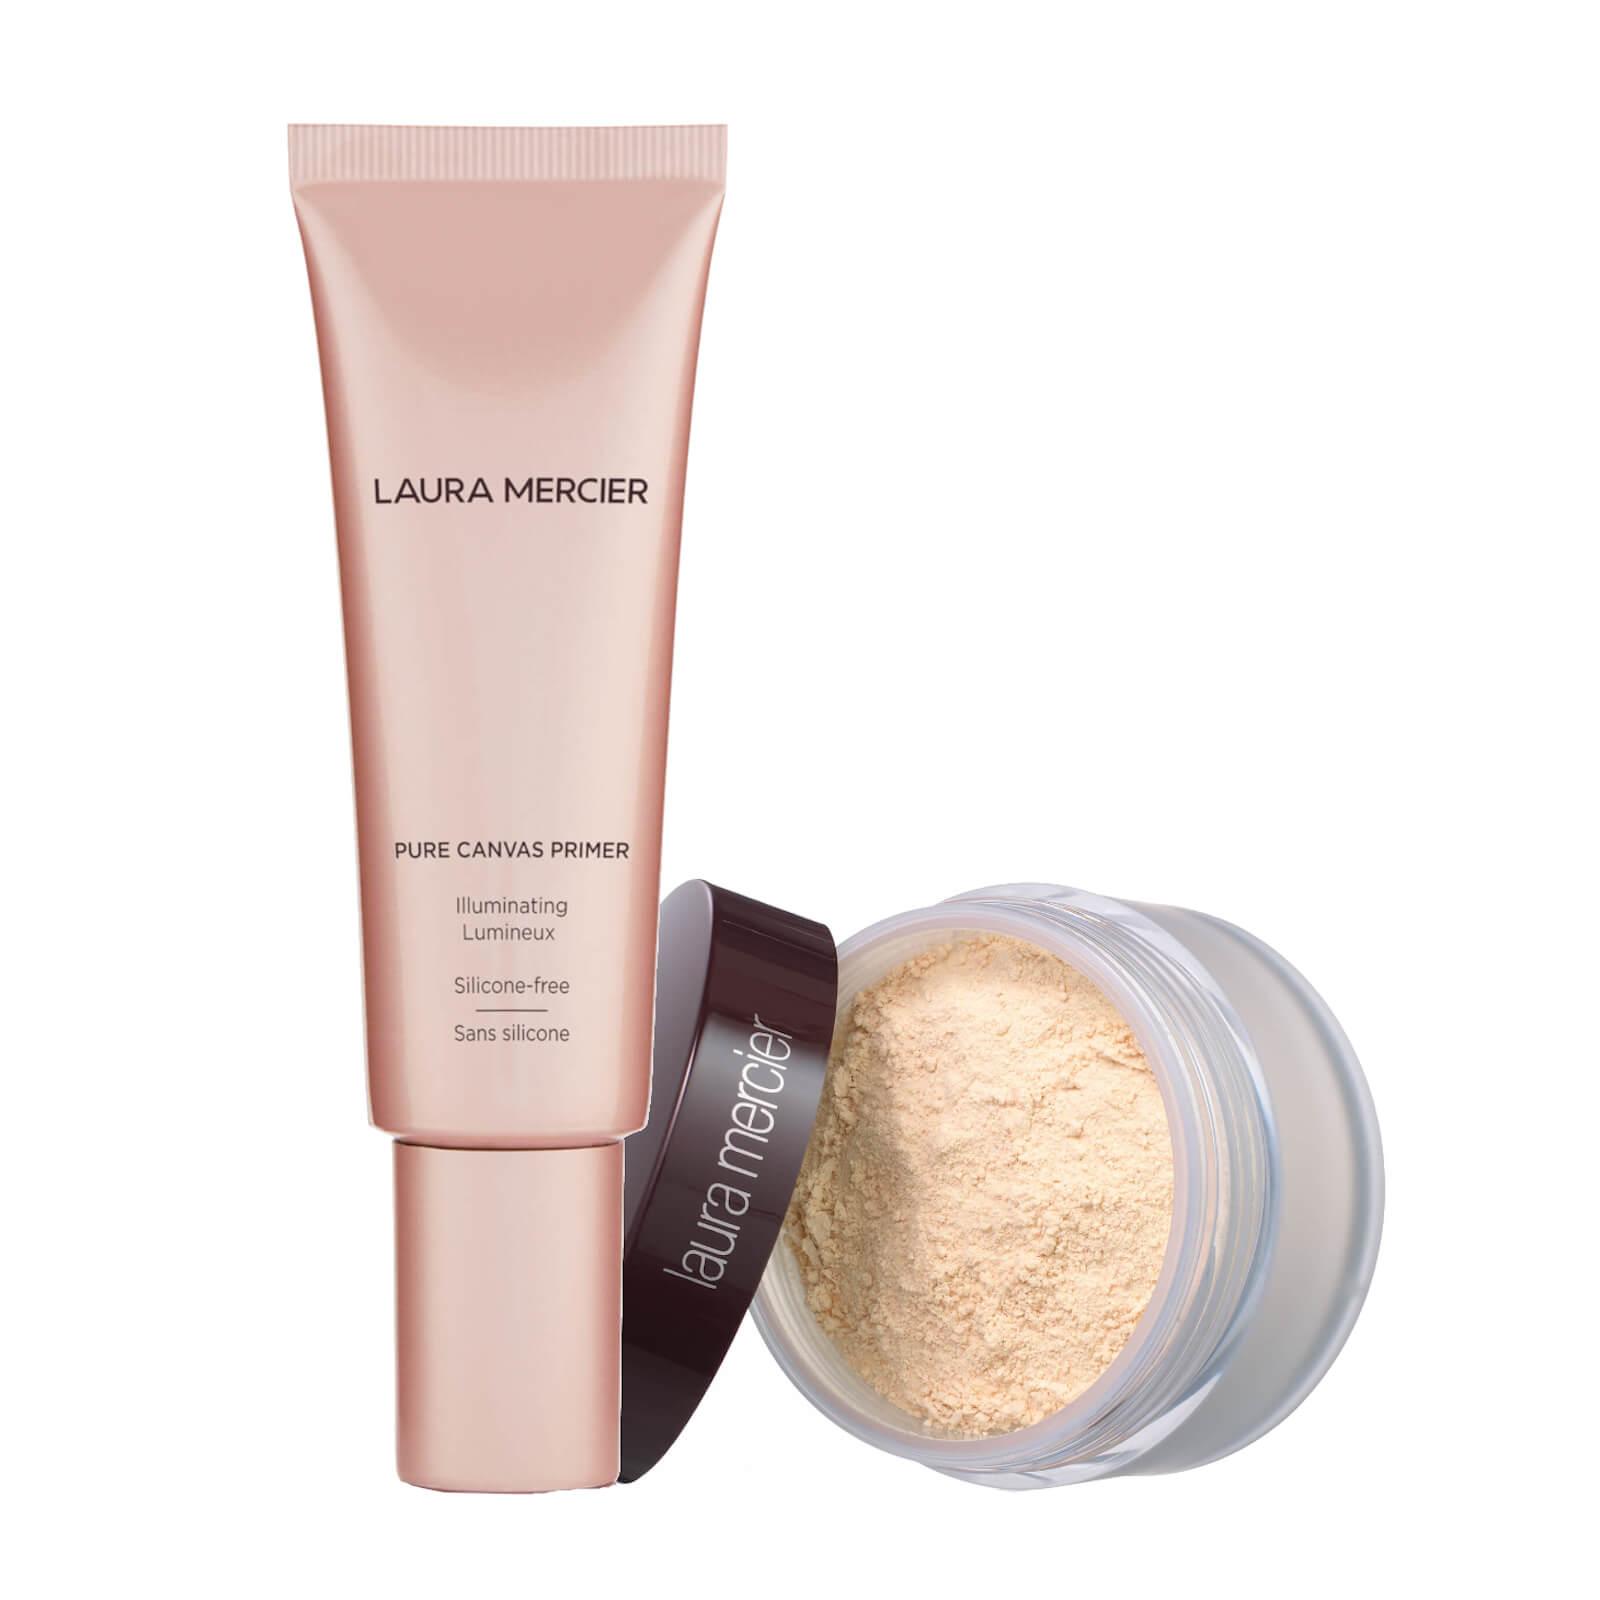 Laura Mercier Pure Canvas Primer Illuminating and Translucent Powder (Various Shades) - Translucent